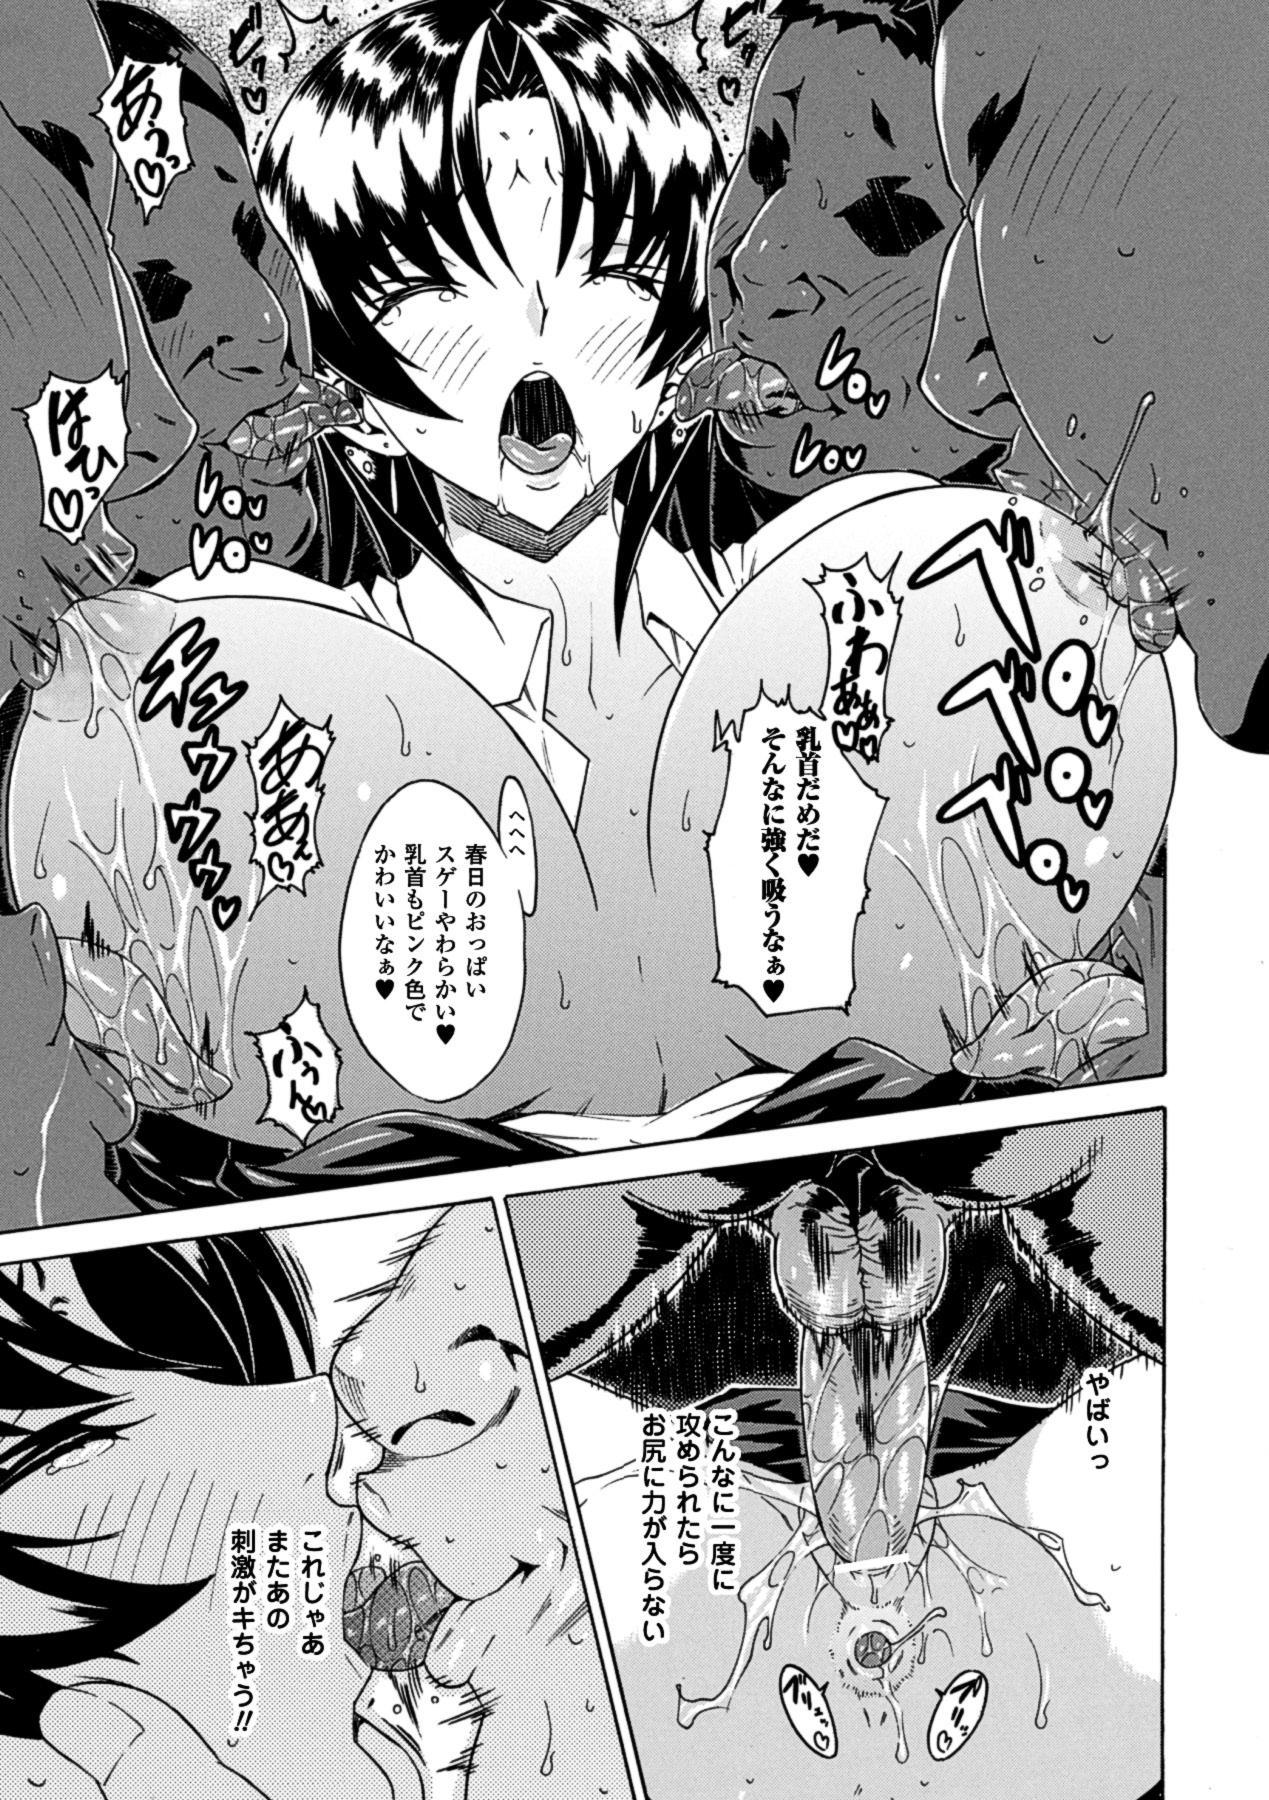 Megami Crisis 10 170